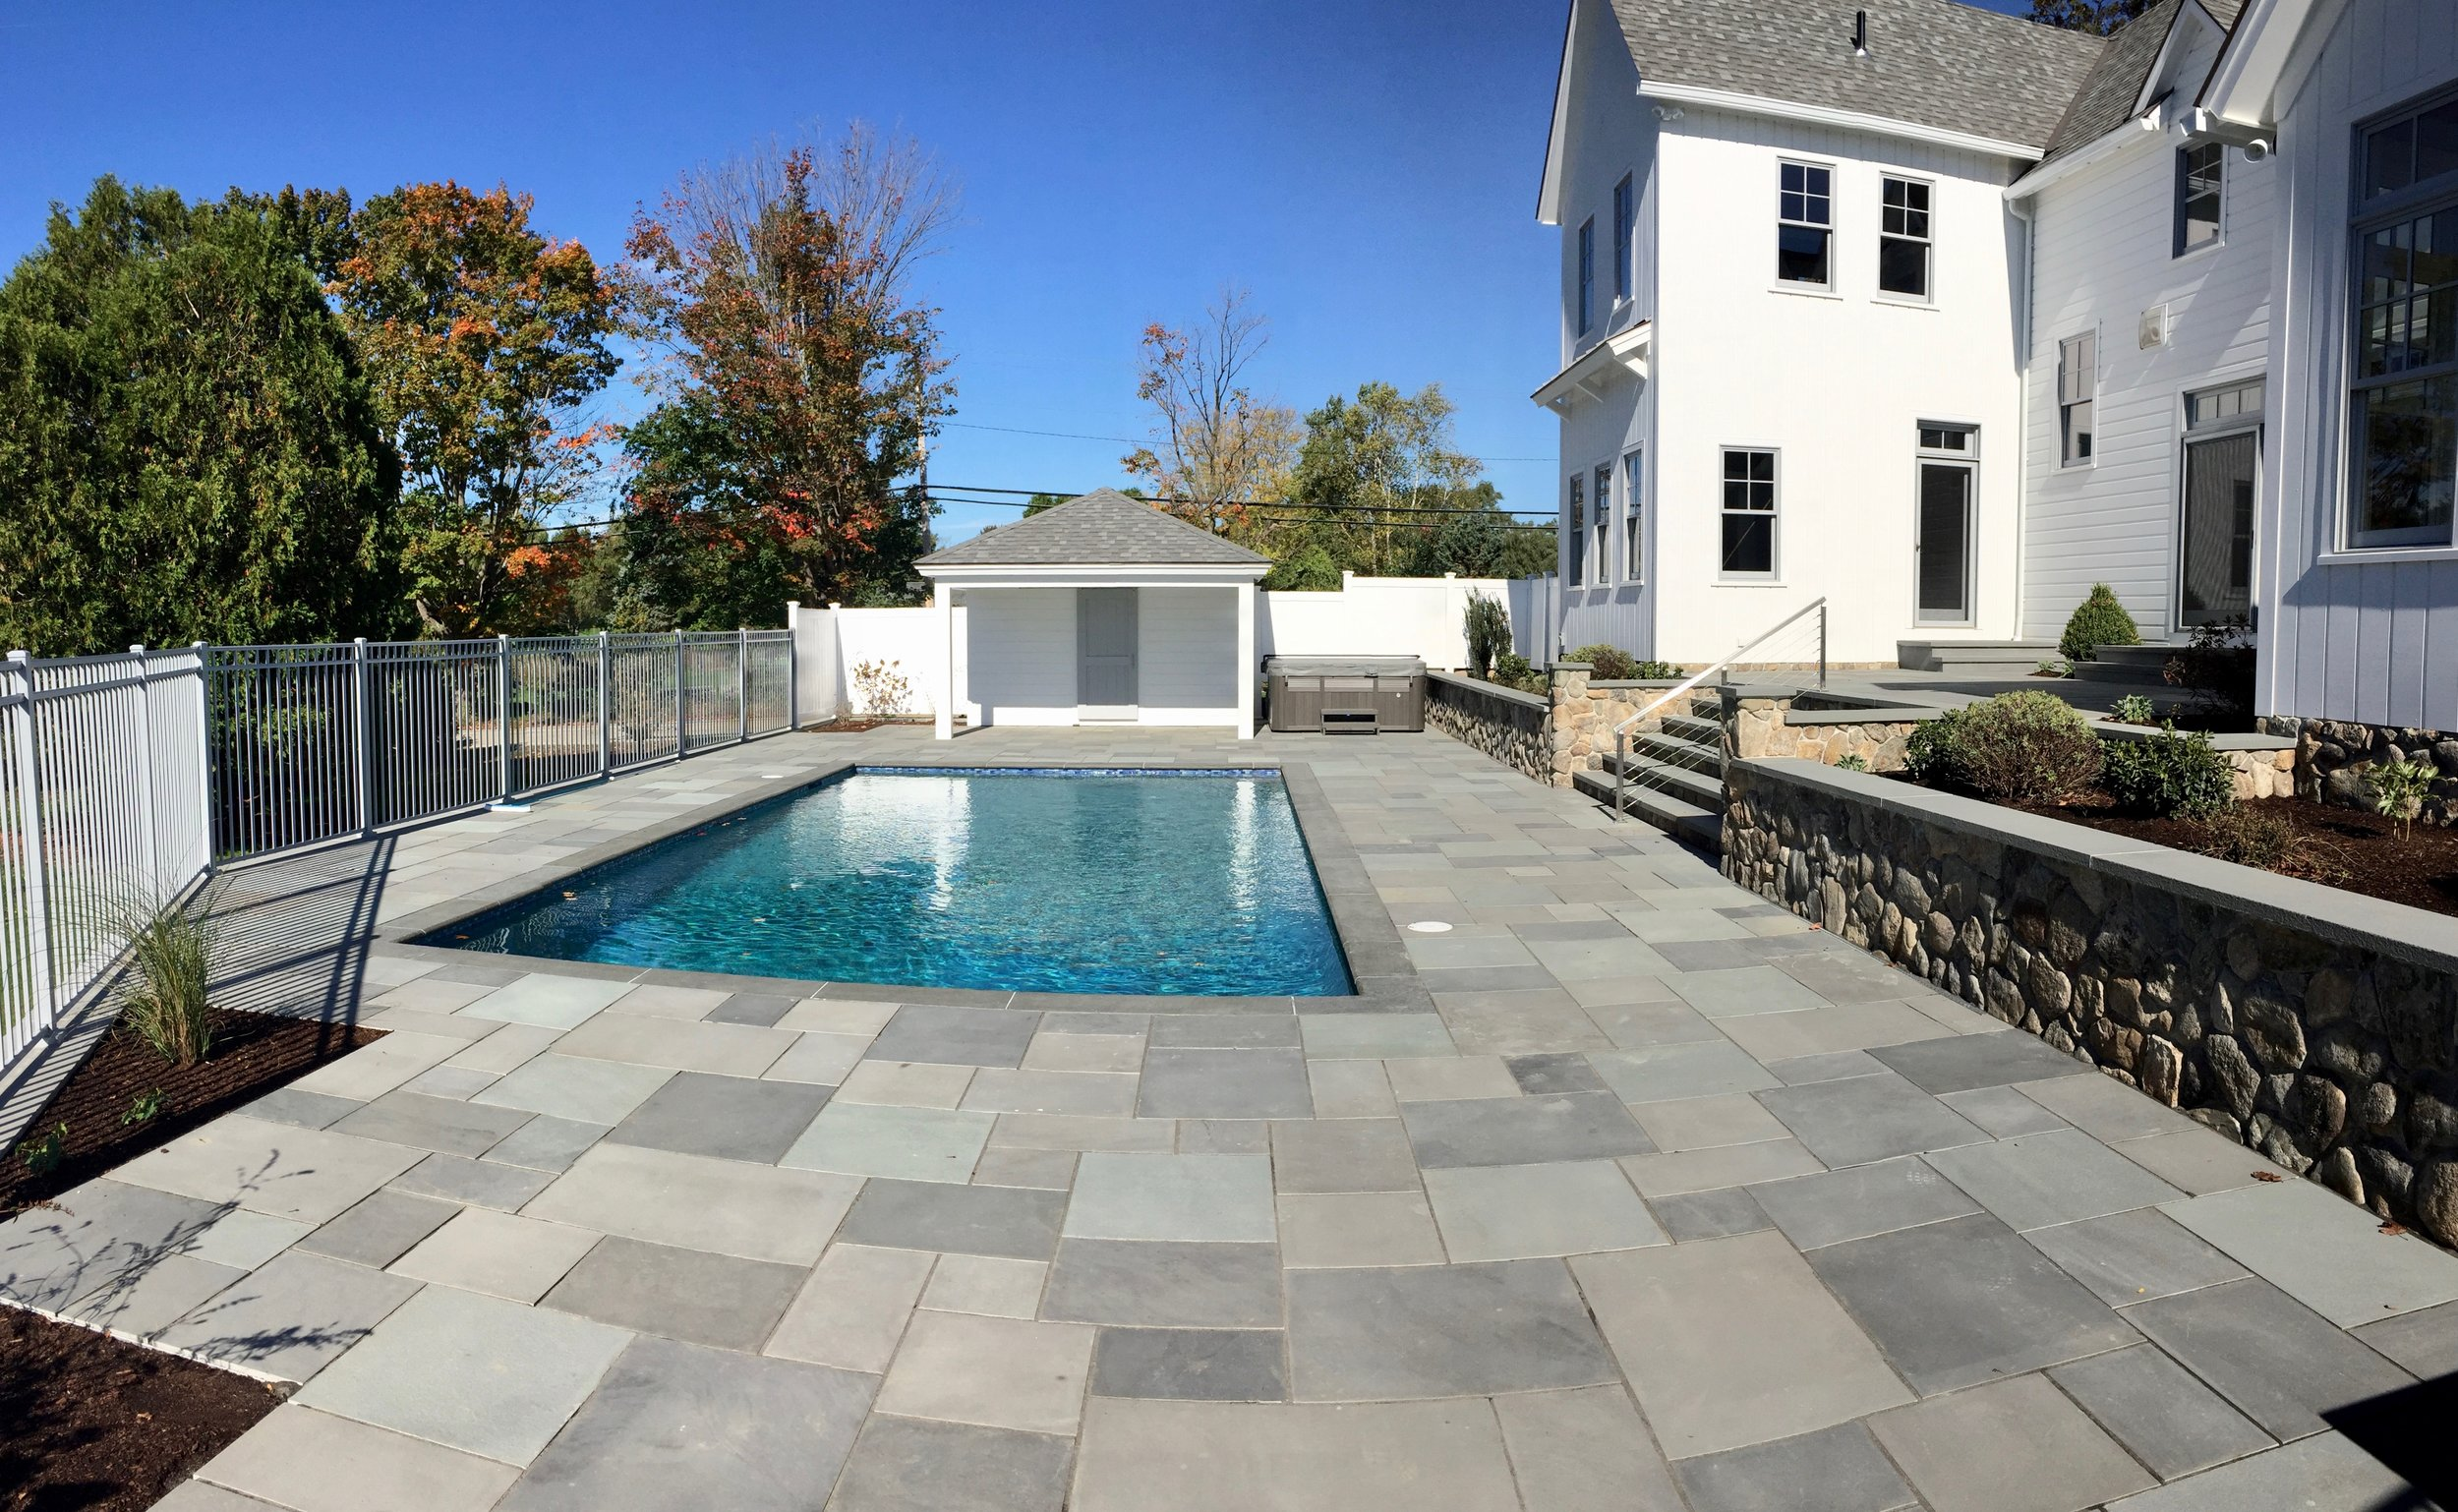 Thermal Ashlar Pattern Bluestone Pool Patio.jpg